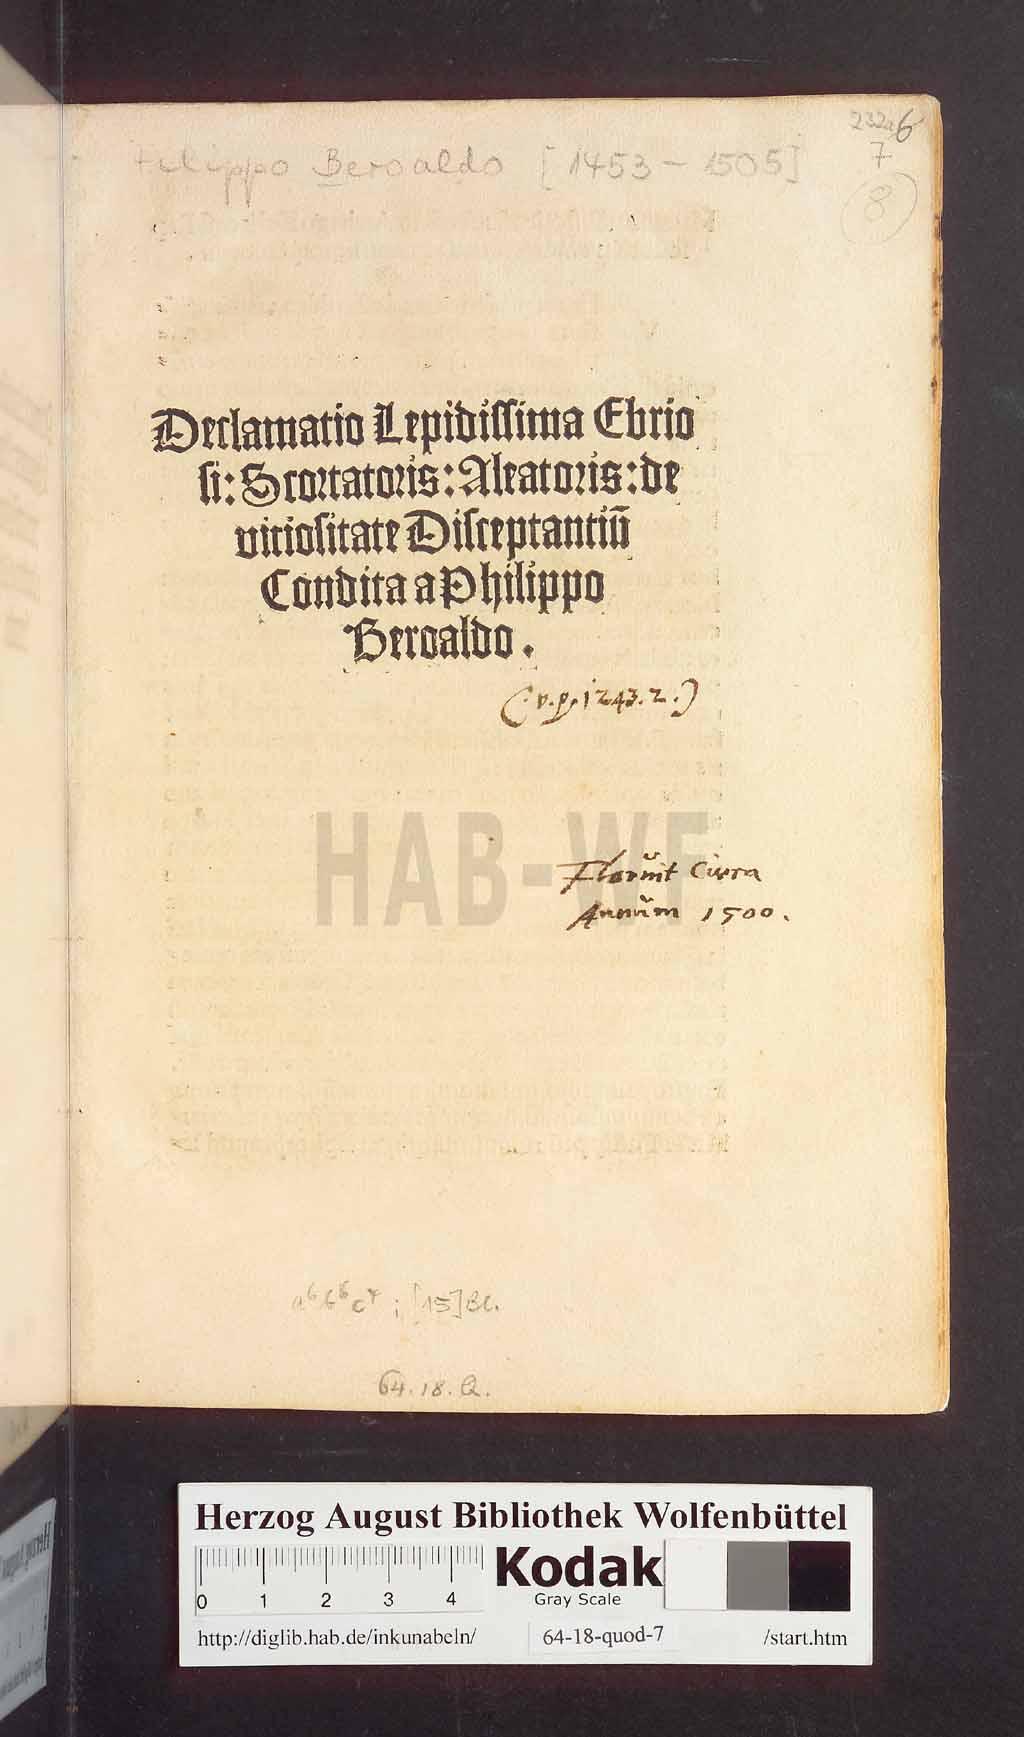 https://diglib.hab.de/drucke/64-18-quod-7/00001.jpg